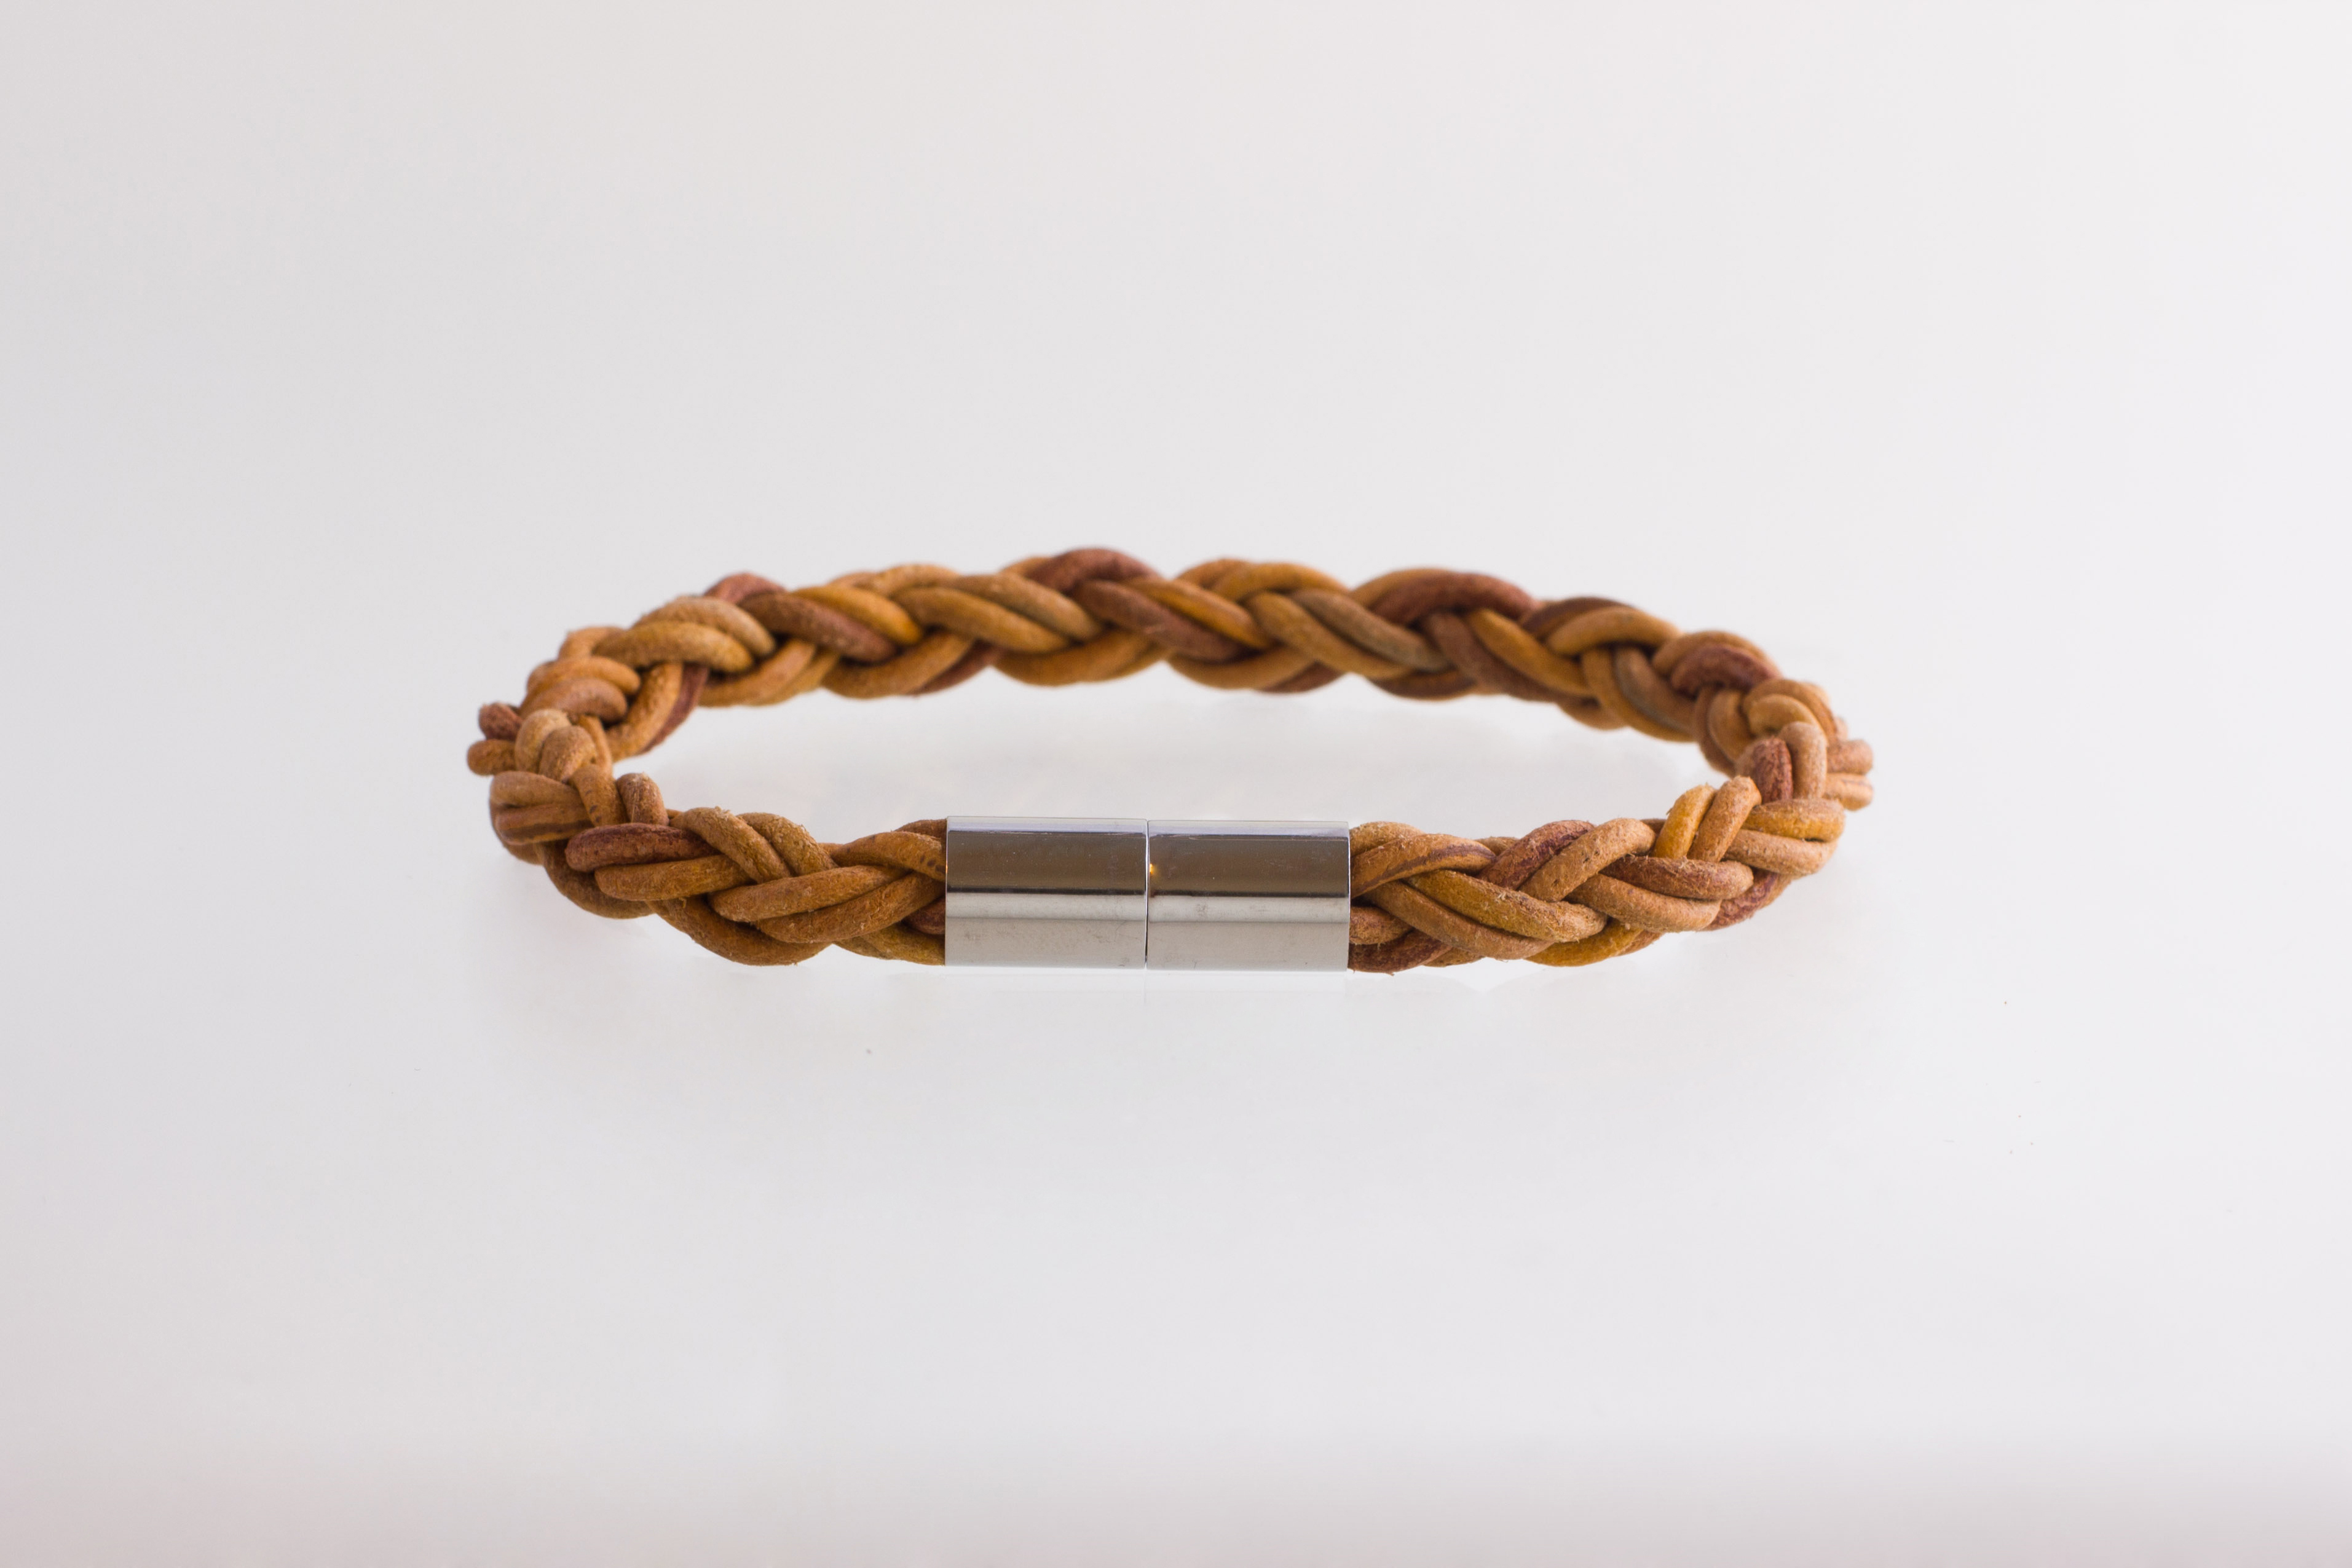 Julia Otilia-Raw braided bracelet with magnet lock-39.95